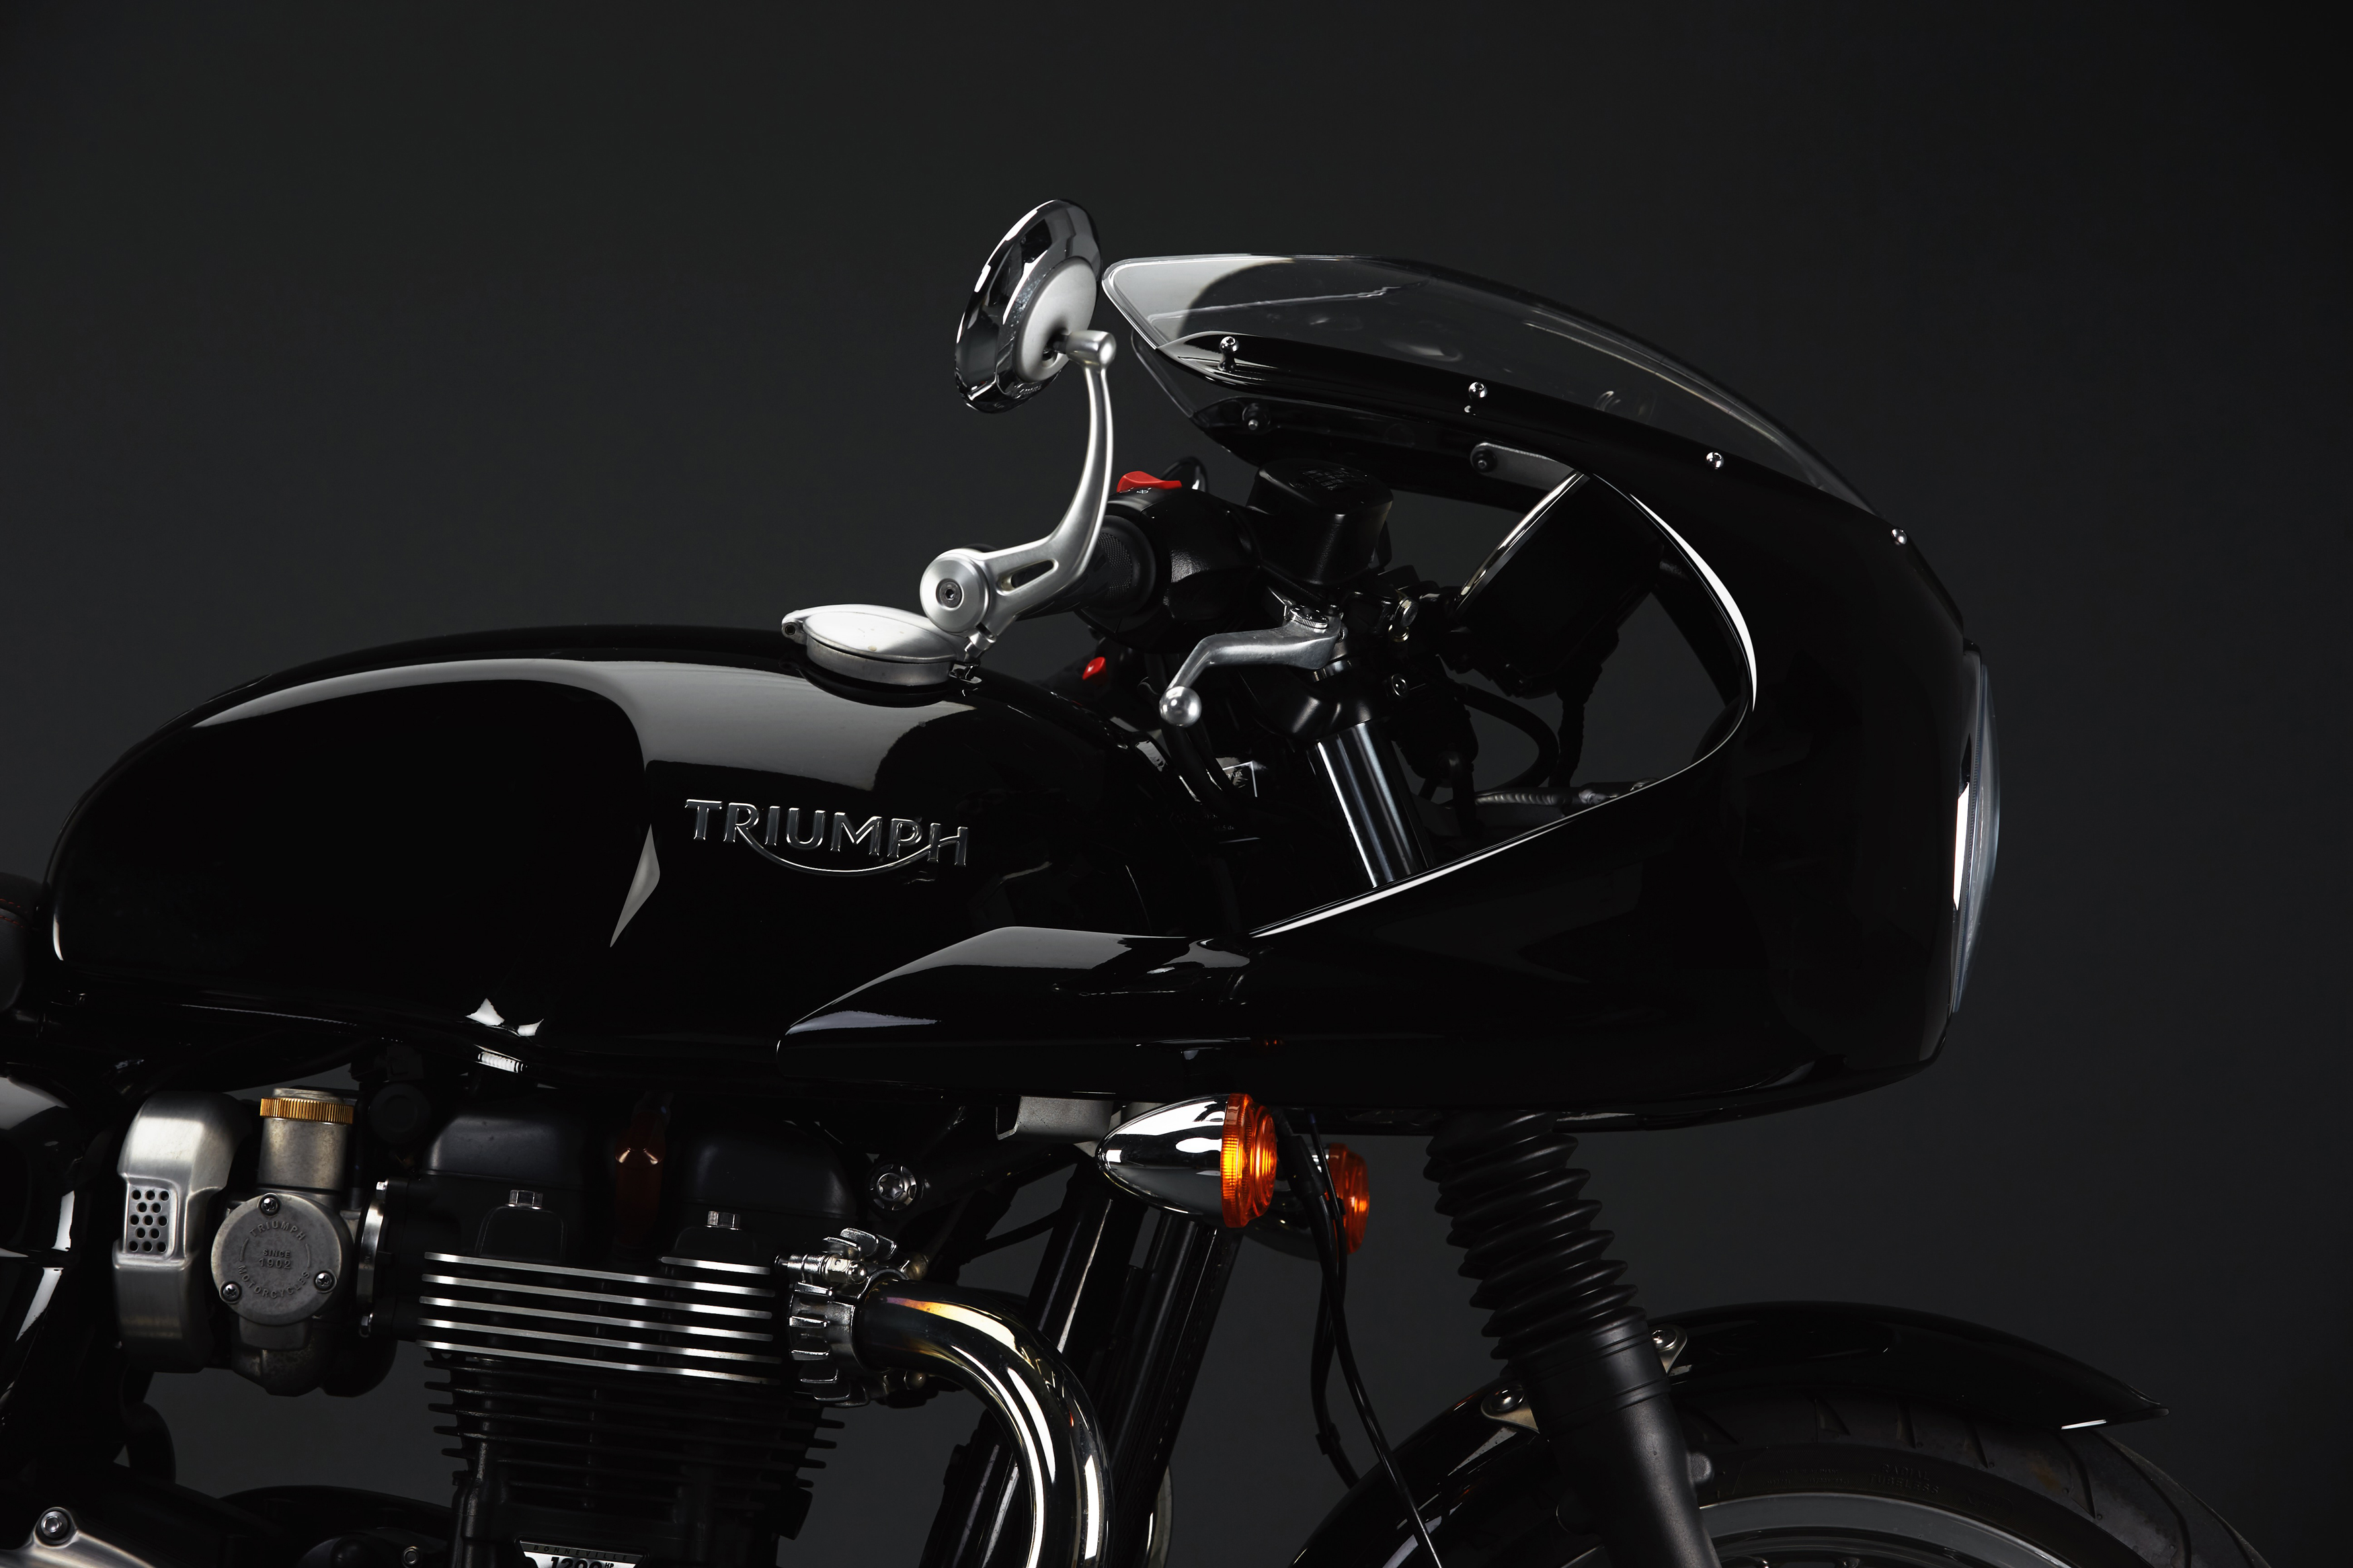 Triumph Thruxton 2016